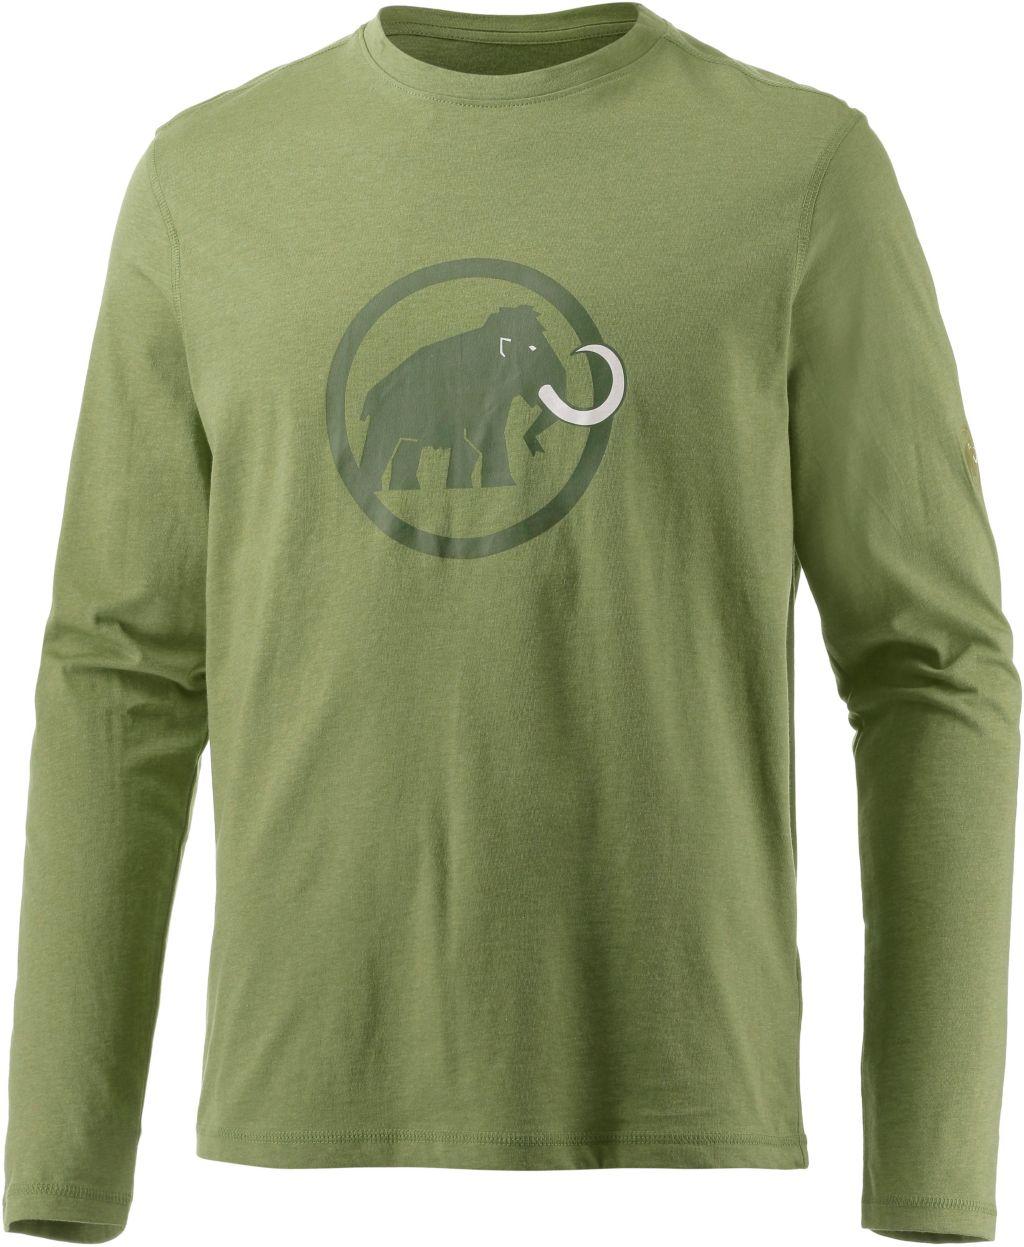 Logo Langarmshirt Herren in grün, Größe XL